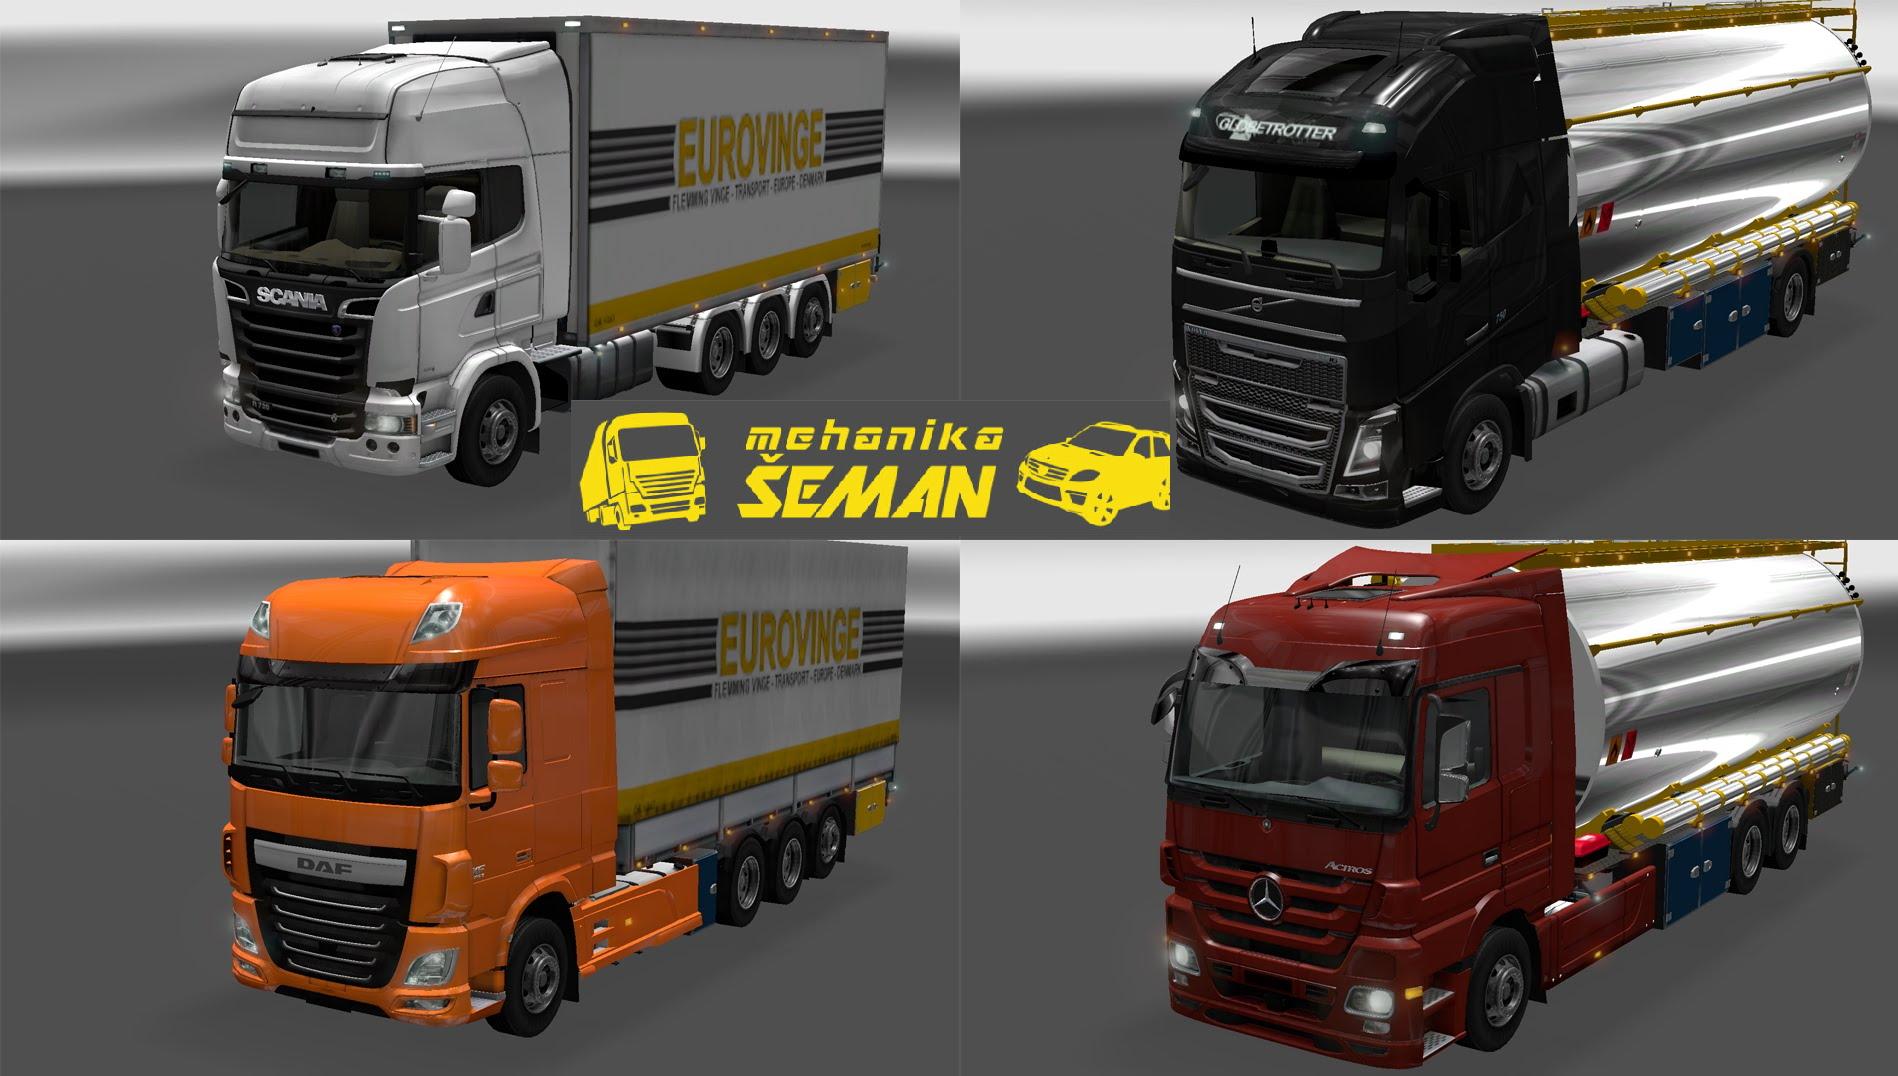 Mehanika Šeman - Servis kamiona